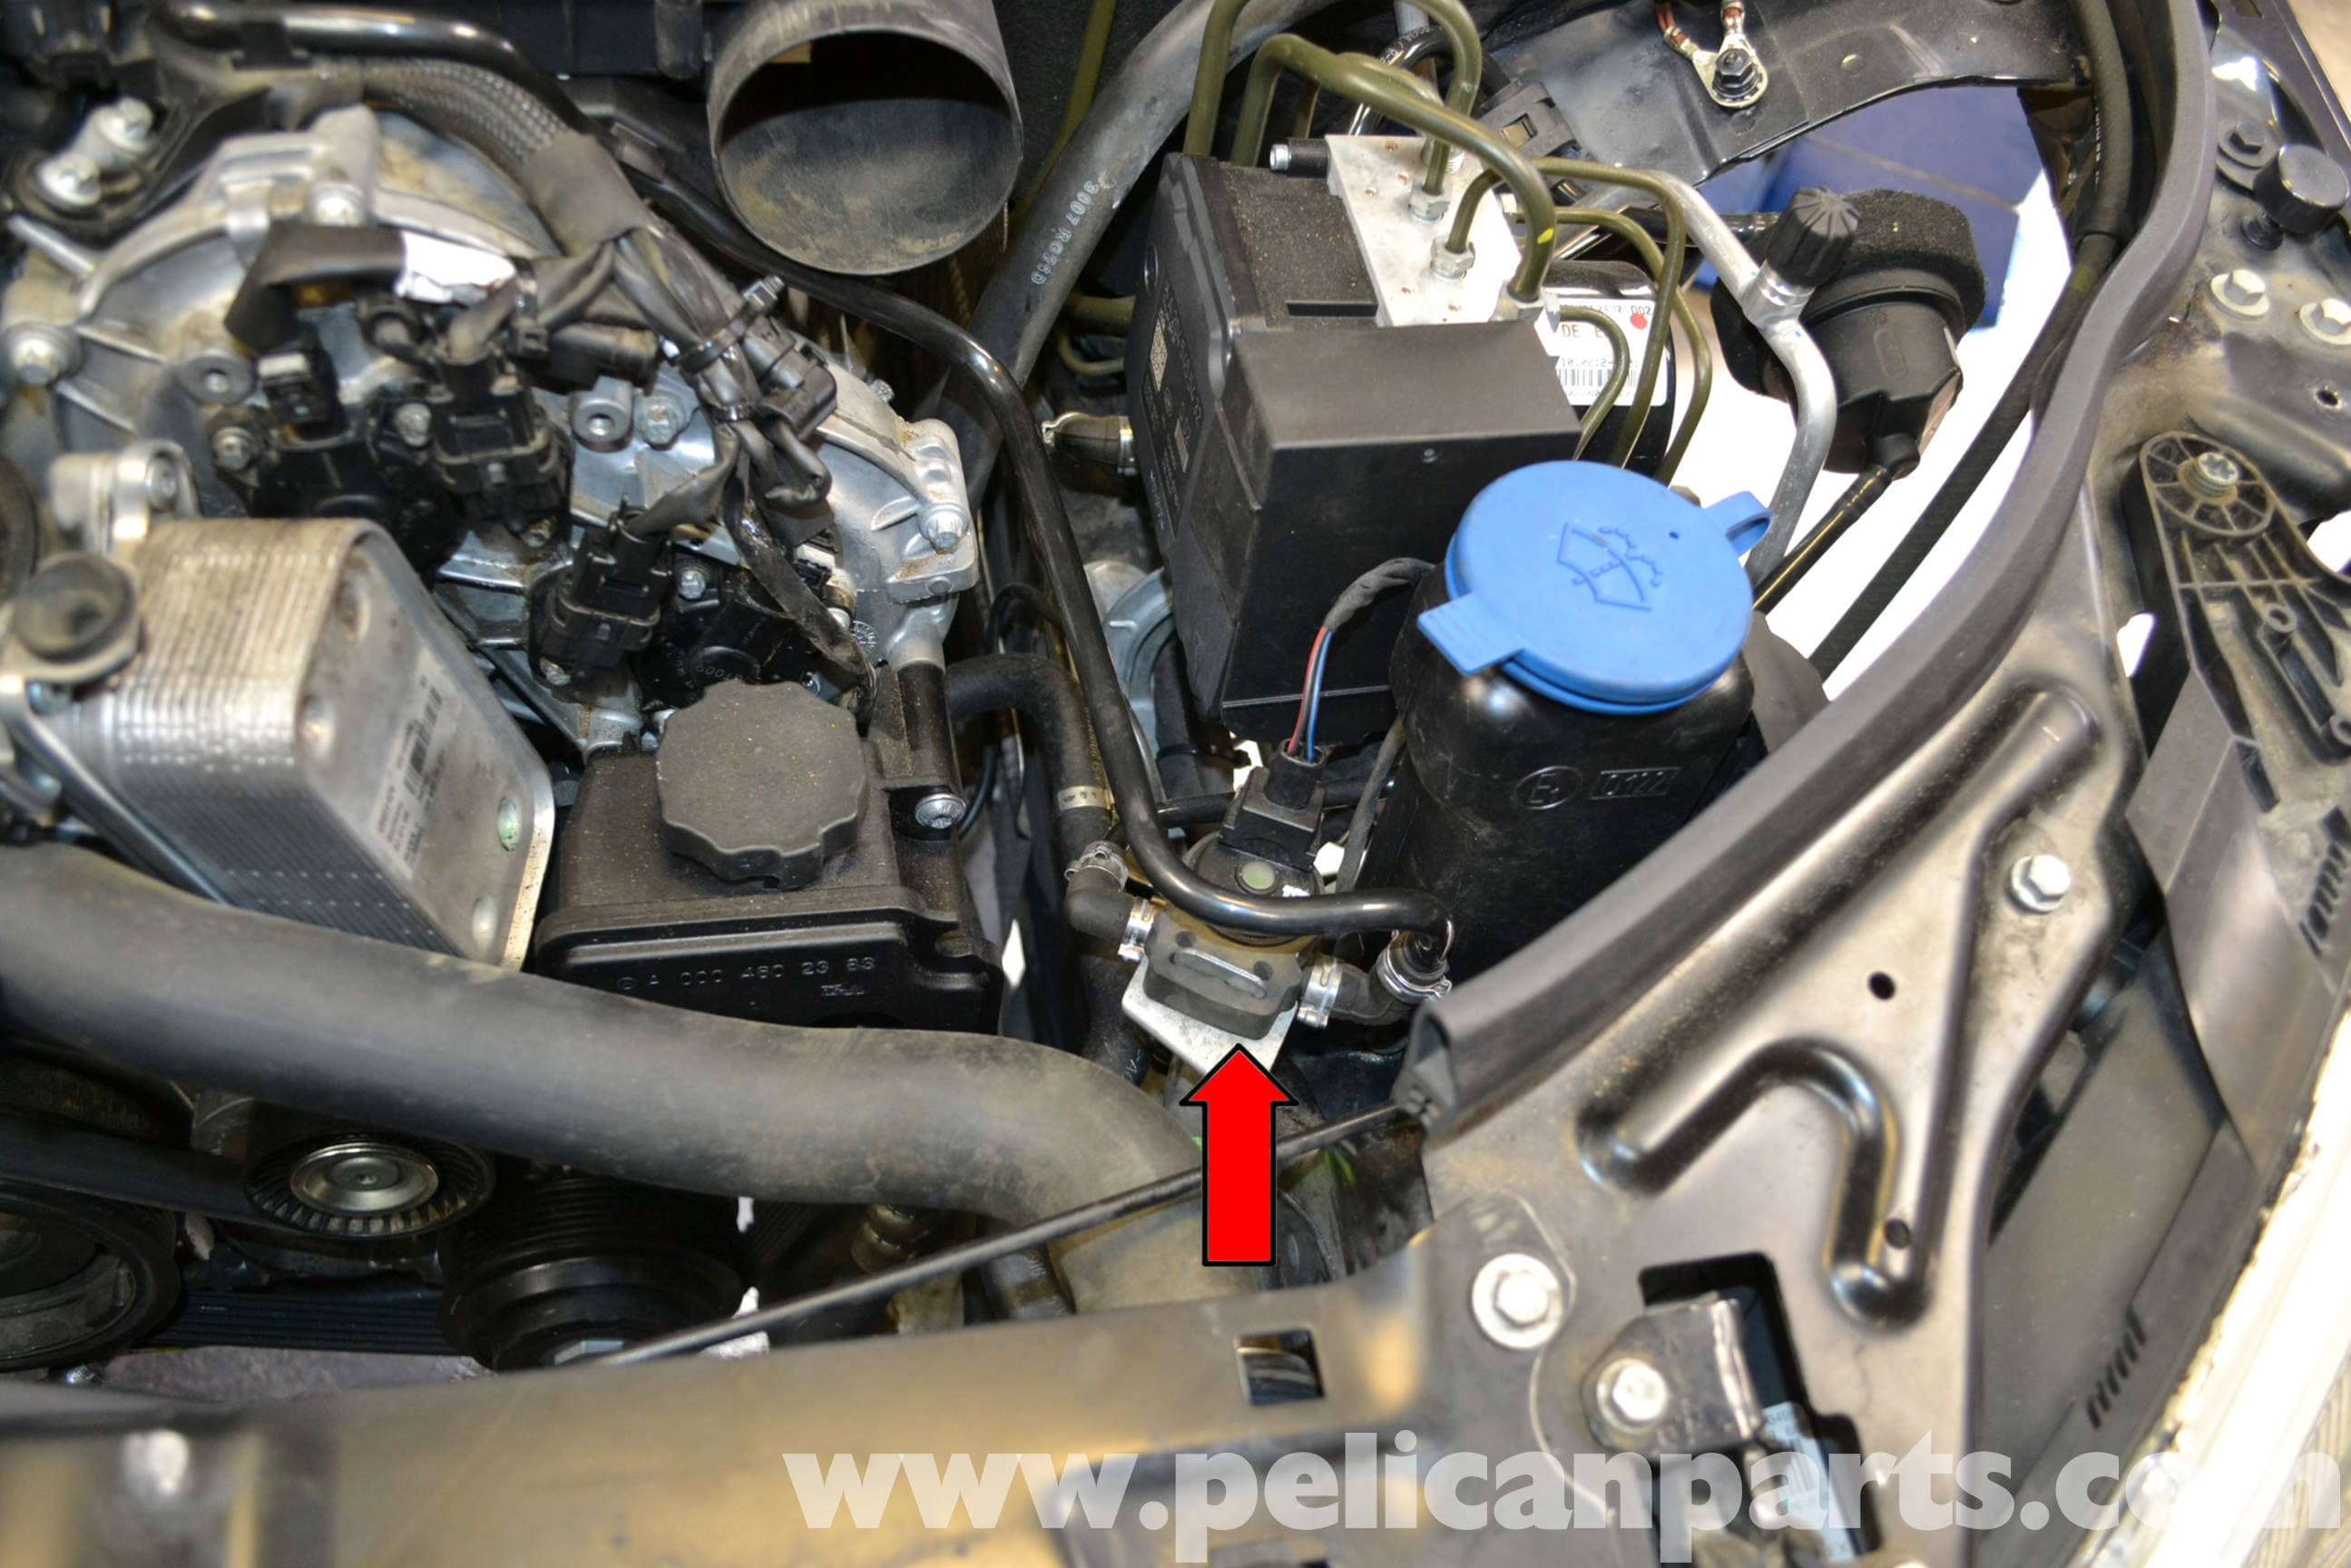 Wiring Diagram Mercedes Benz W204 Purge Valve Replacement 2008 2014